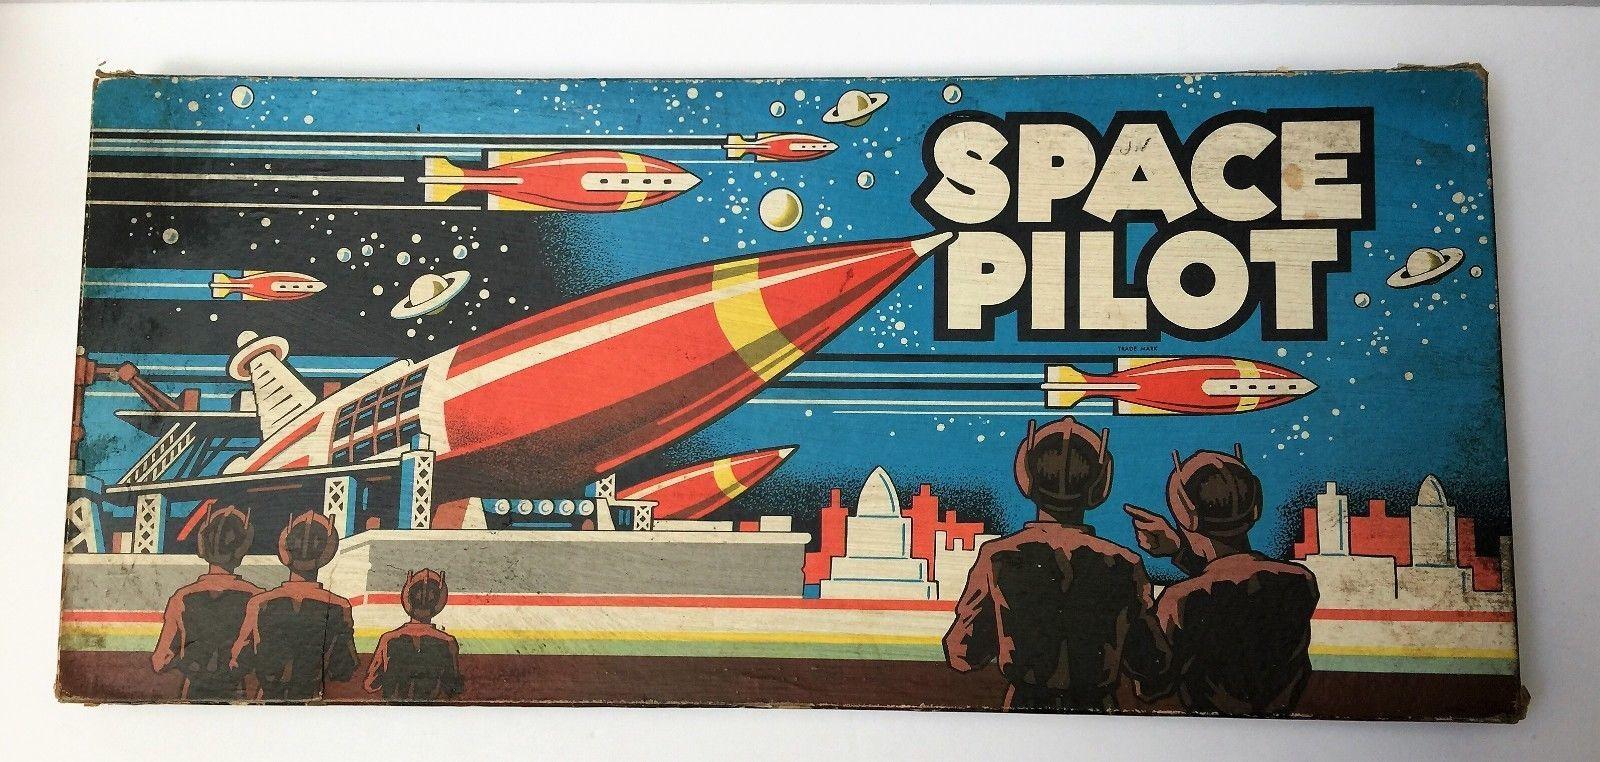 VTG Vintage 1951 Space Pilot by Cadaco Ellis Board Game HARD TO FIND HTF image 2